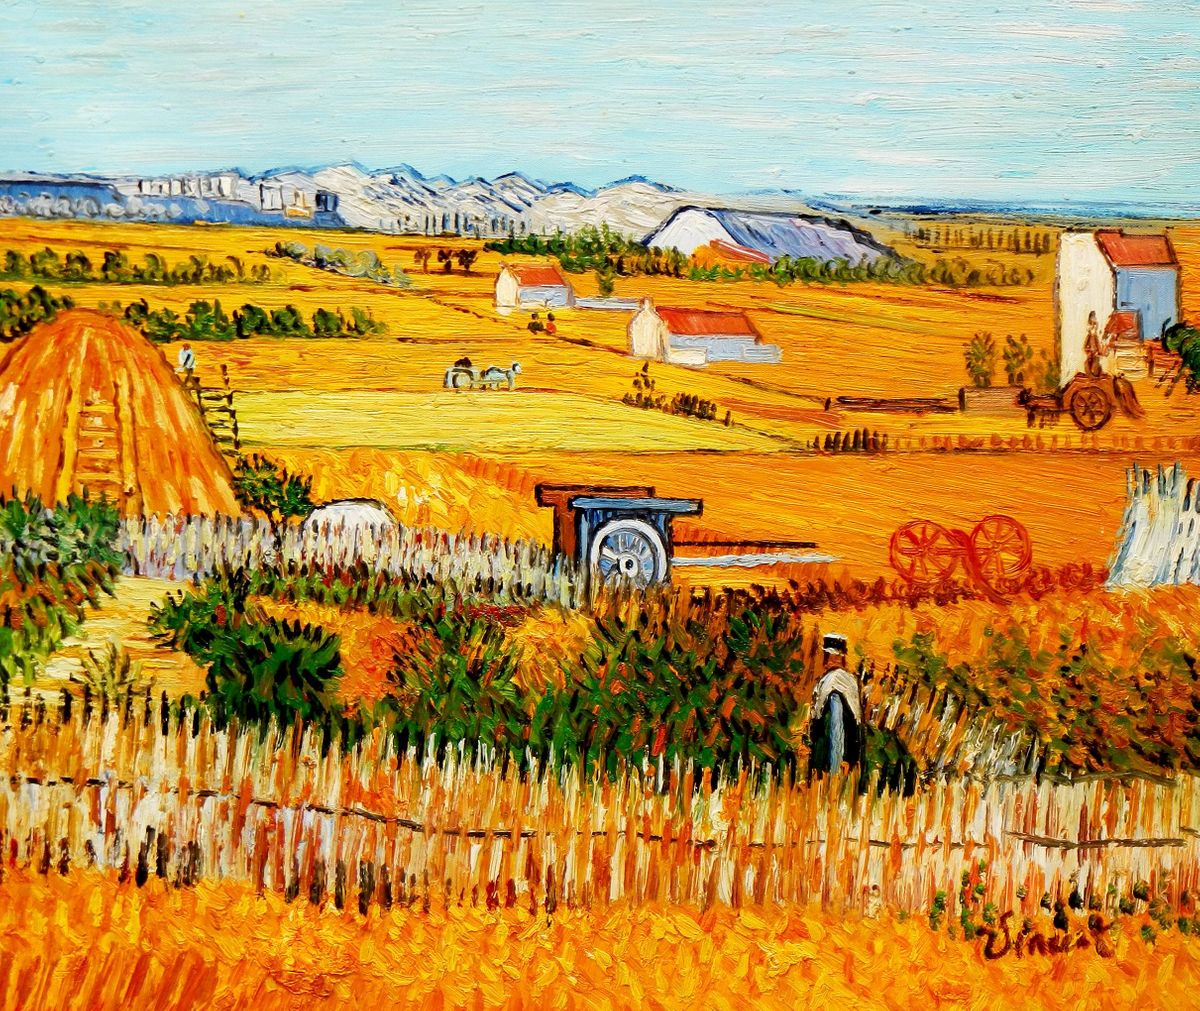 Vincent van Gogh - Erntelandschaft c96065 50x60cm Gemälde handgemalt